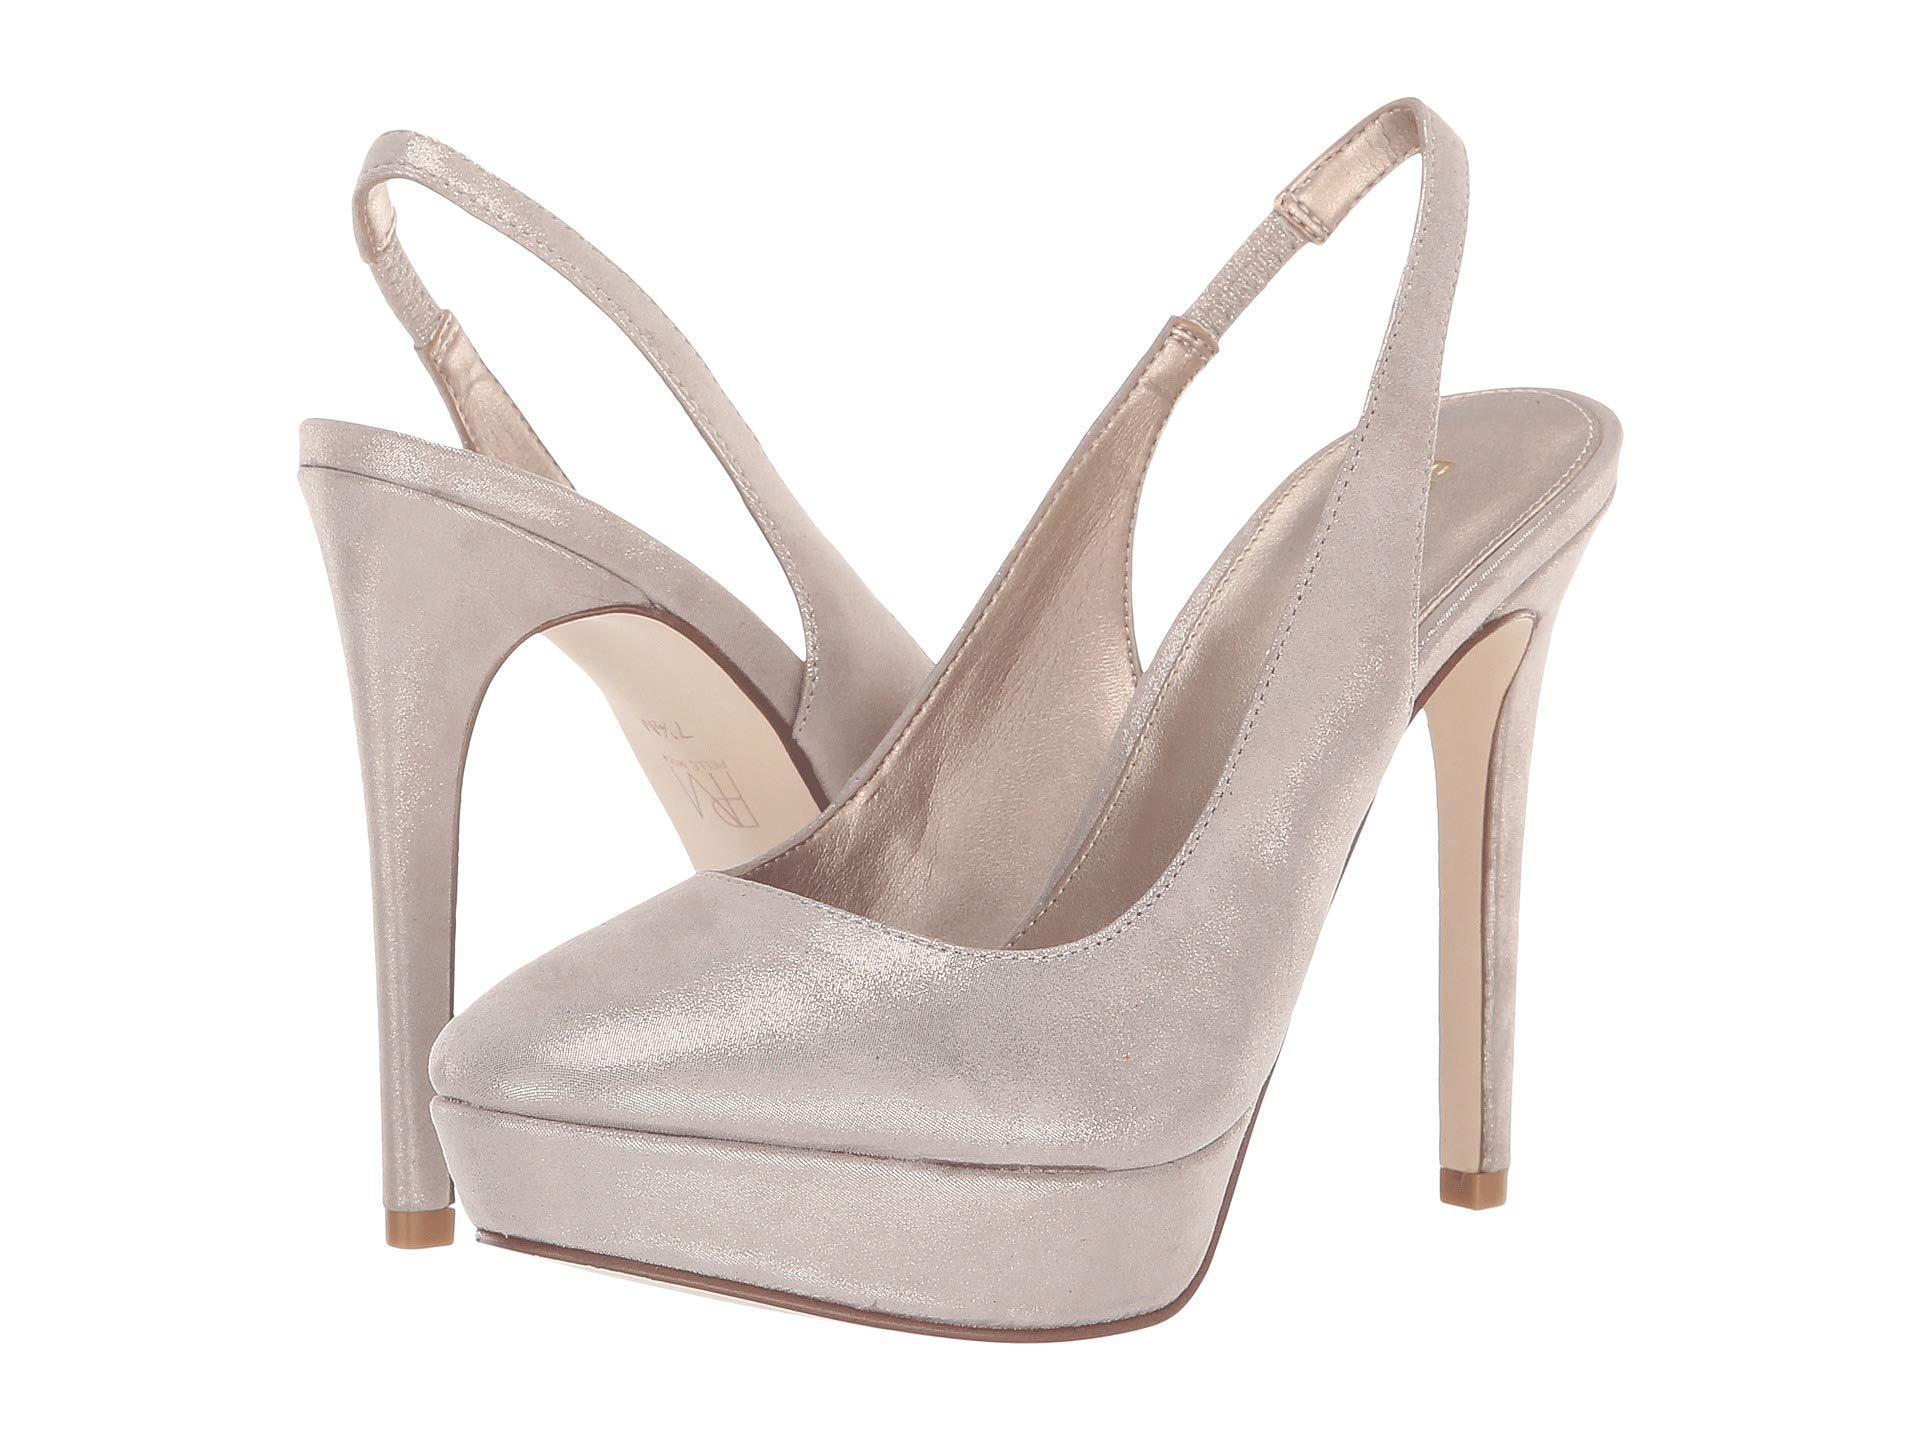 382e5602d291 Lyst - Pelle Moda Shadow (black Suede) Women s Shoes